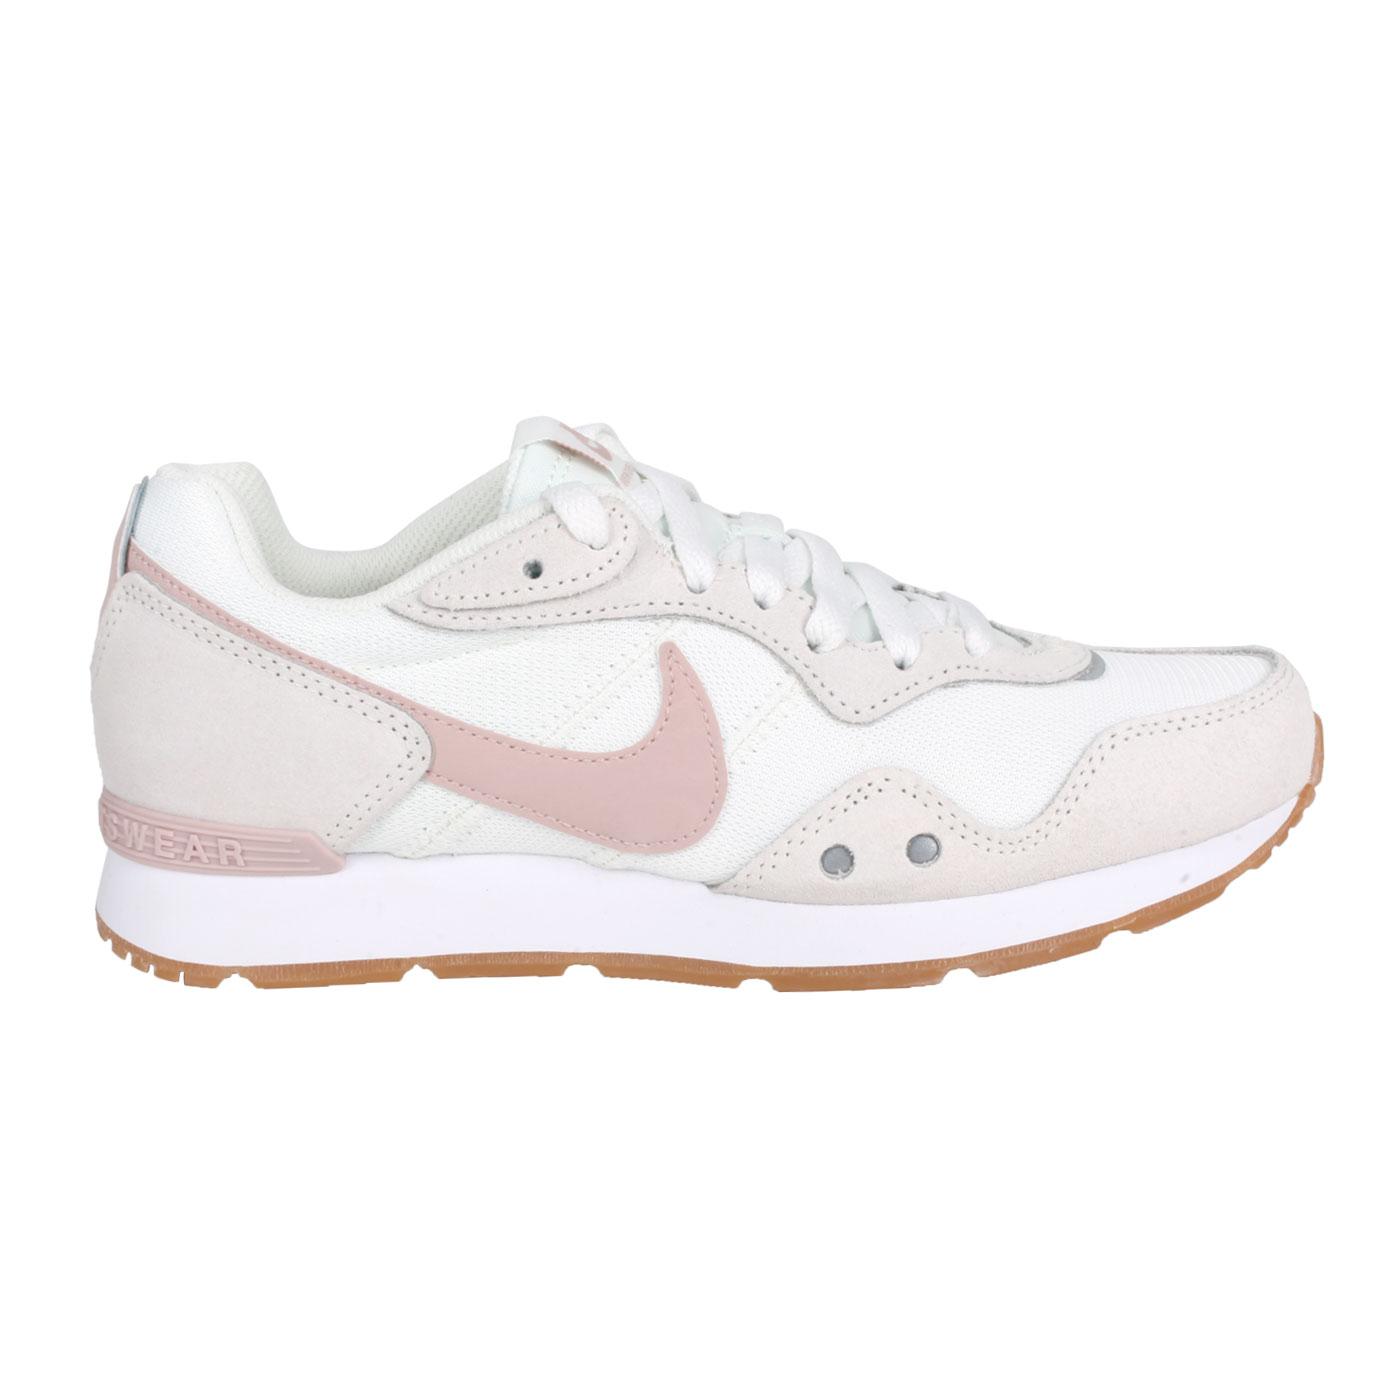 NIKE 女款復古運動鞋  @WMNS VENTURE RUNNER WIDE@DM8454-106 - 白灰粉